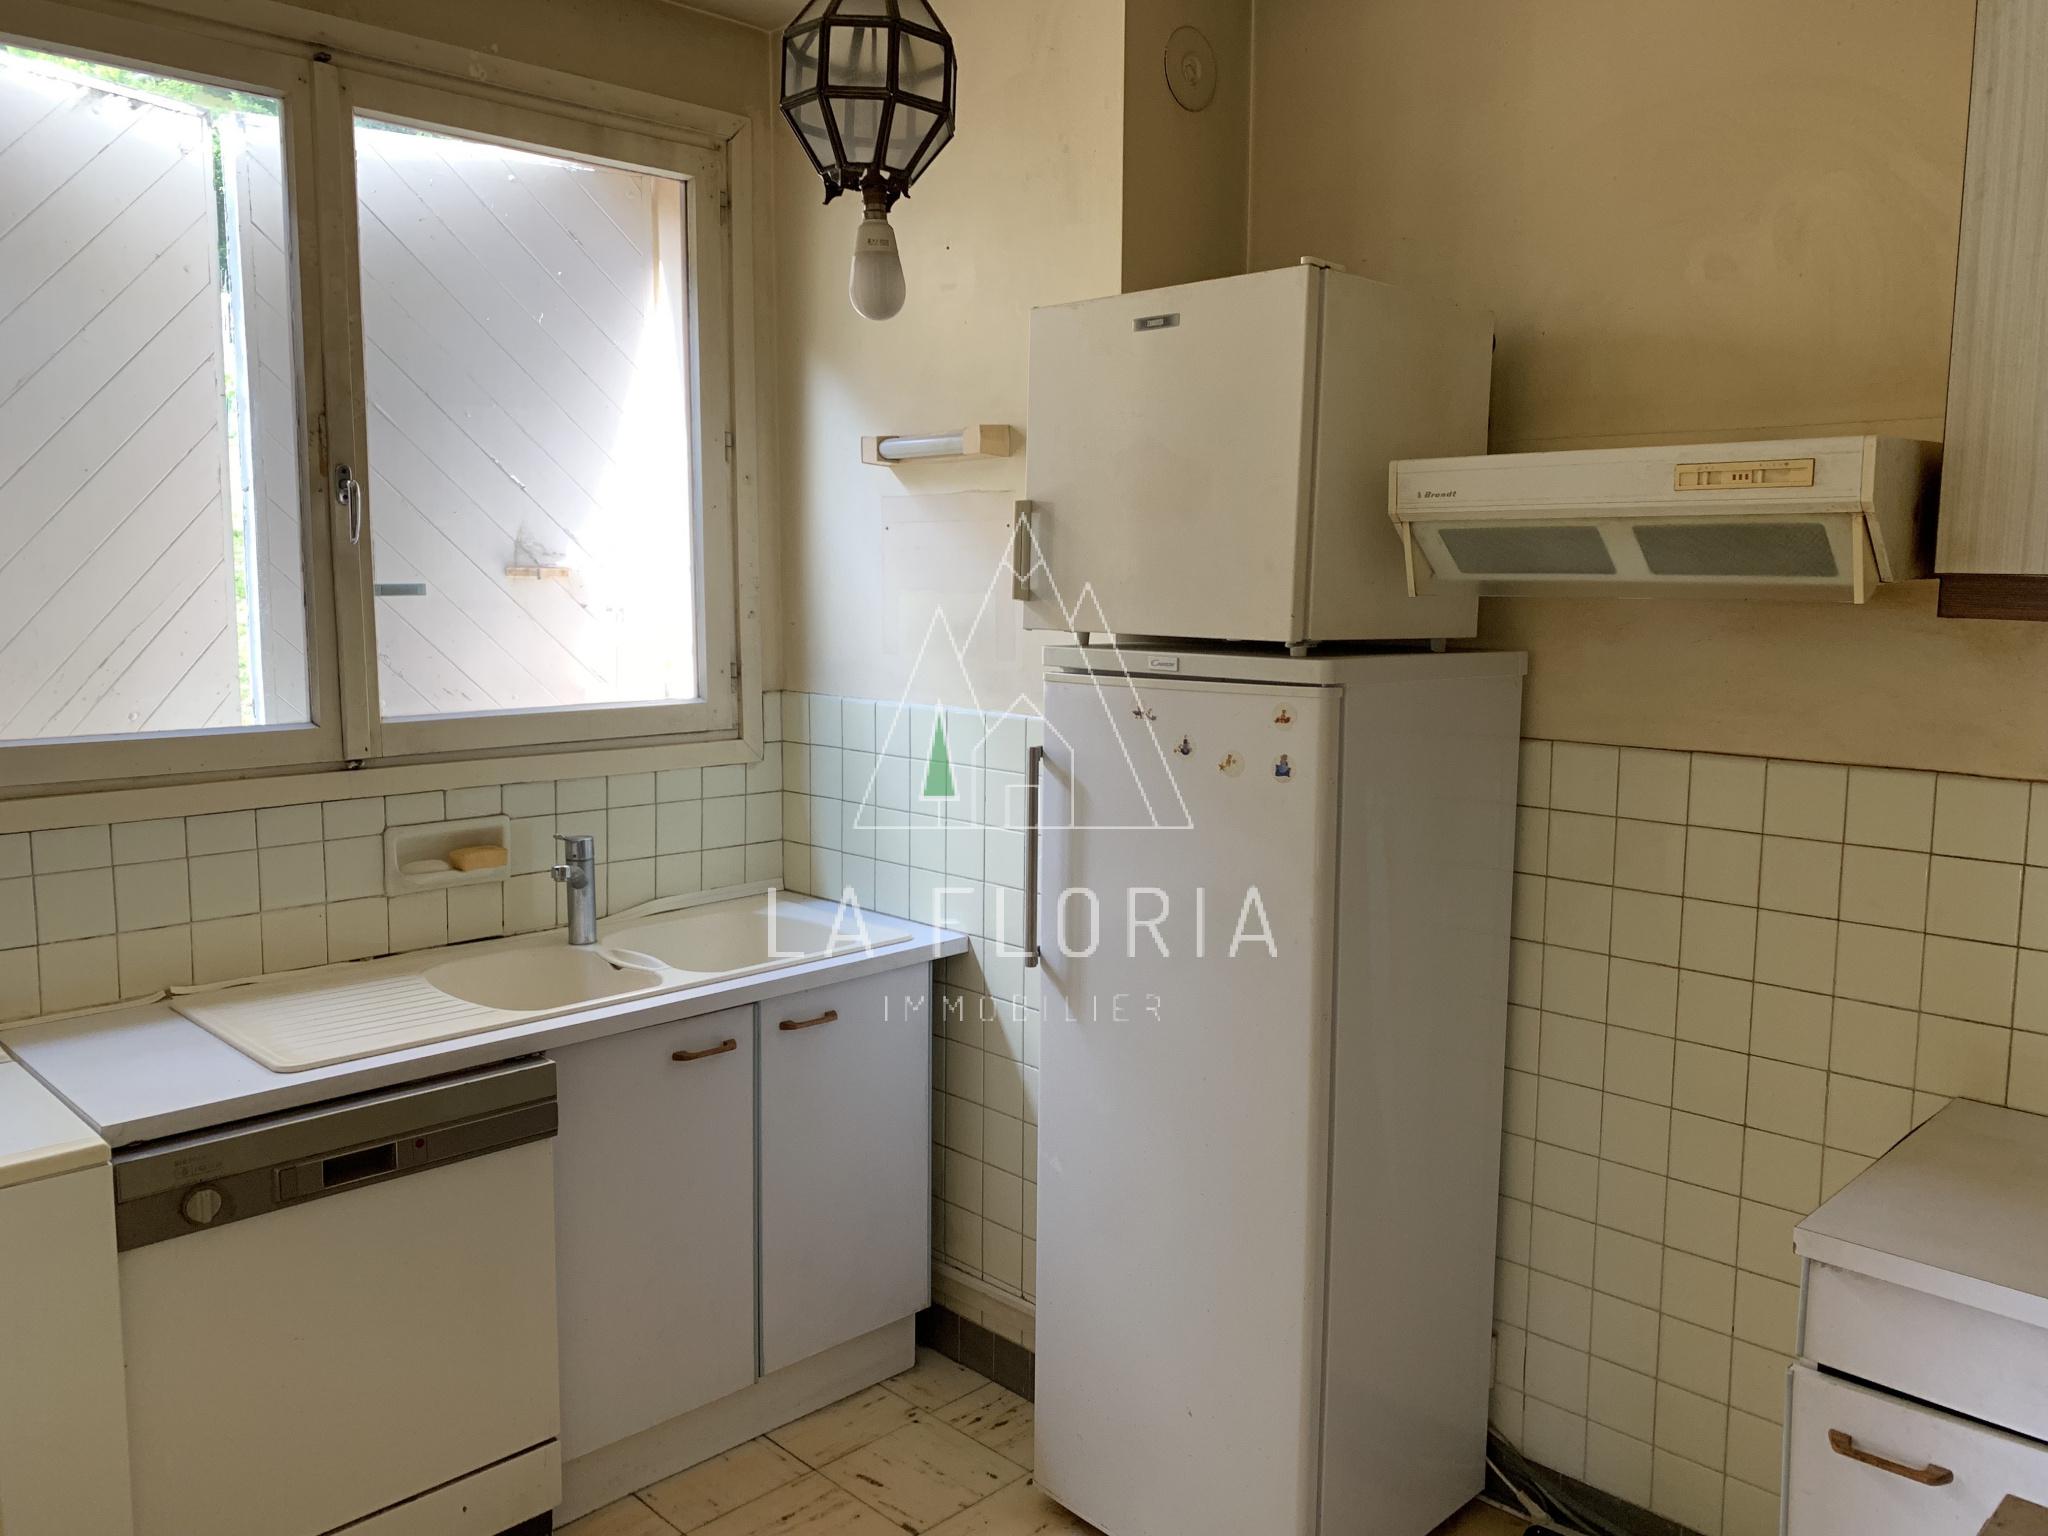 2 BEDROOM APARTMENT TO REFURBISH, CHAMONIX LES NANTS